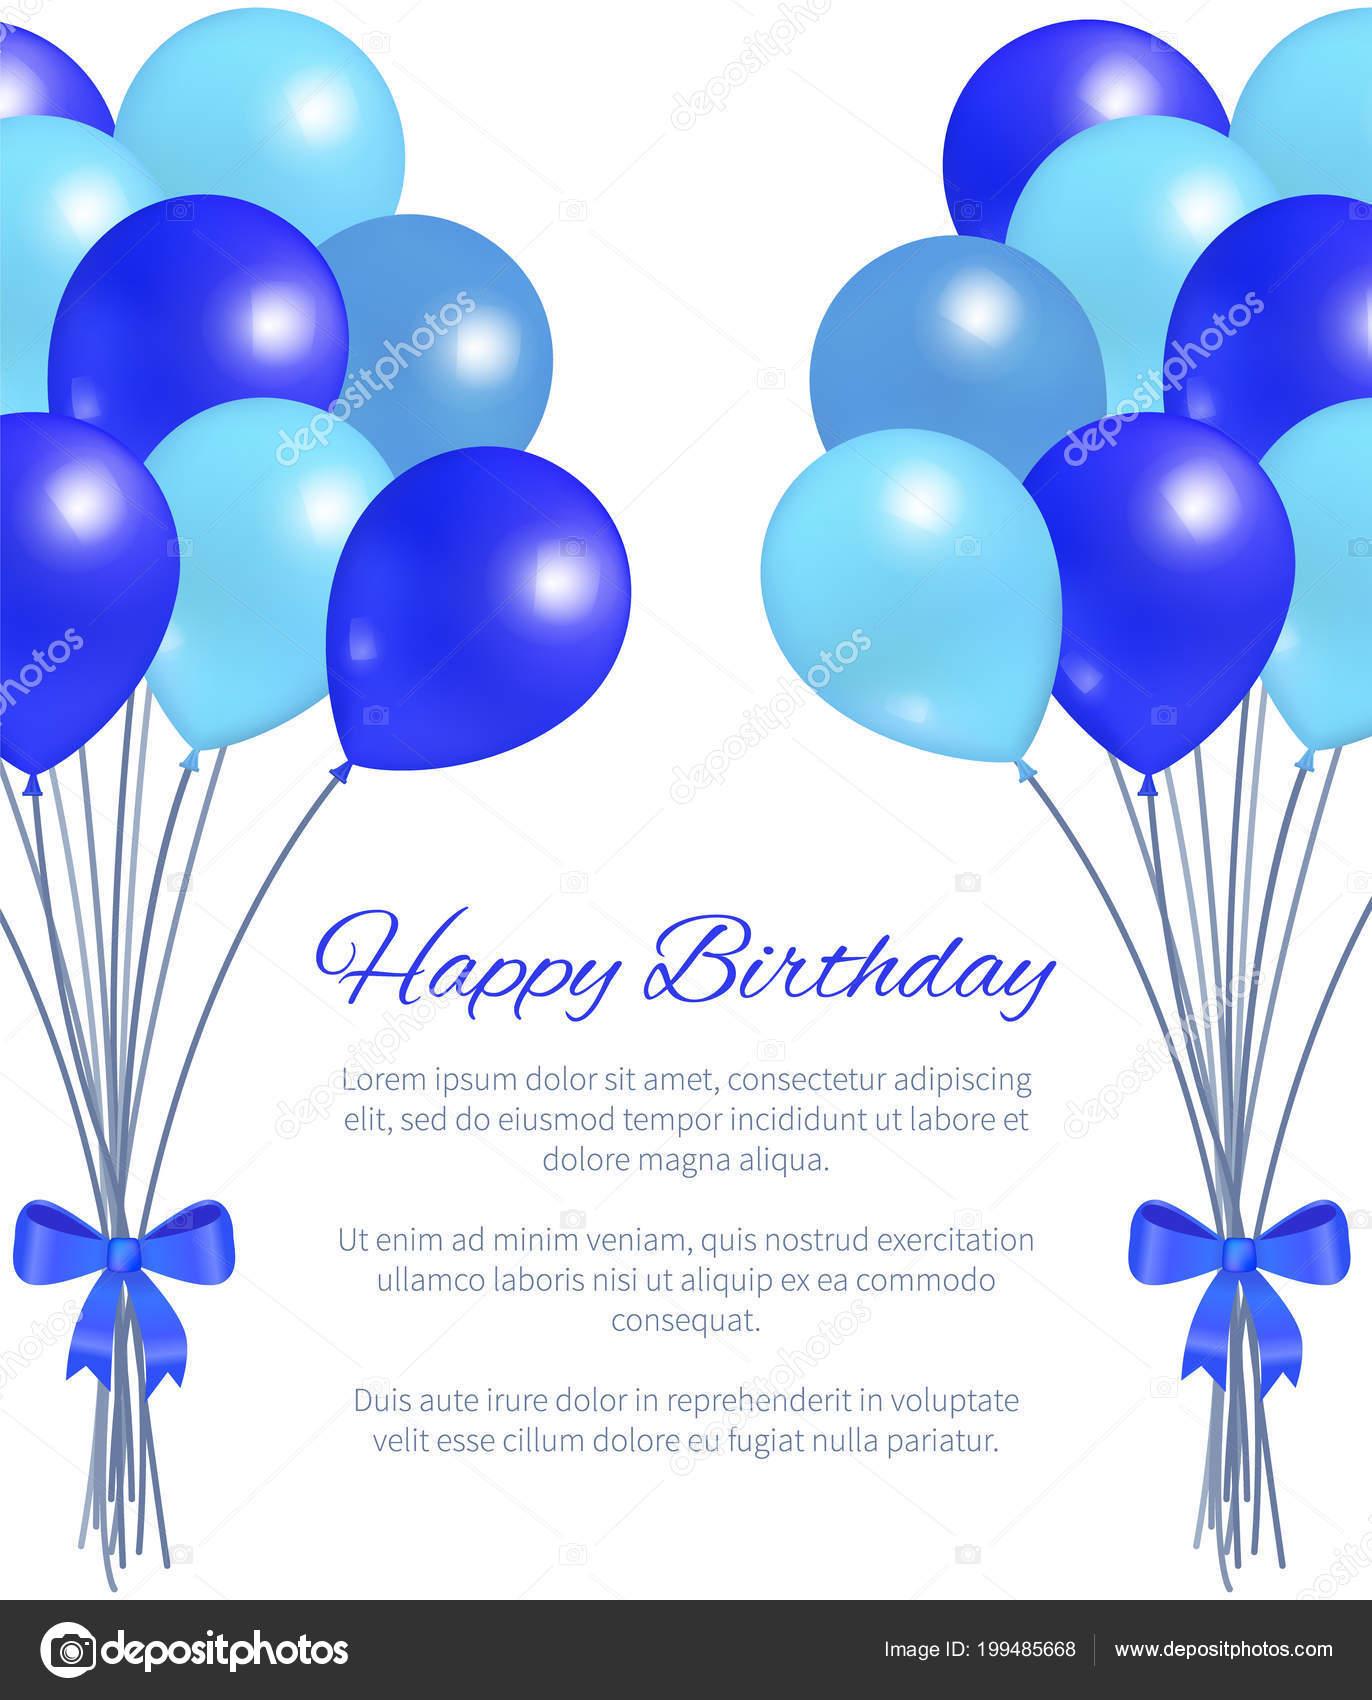 Happy Birthday Greeting Card Ballons Grosses Bundel Stockillustration